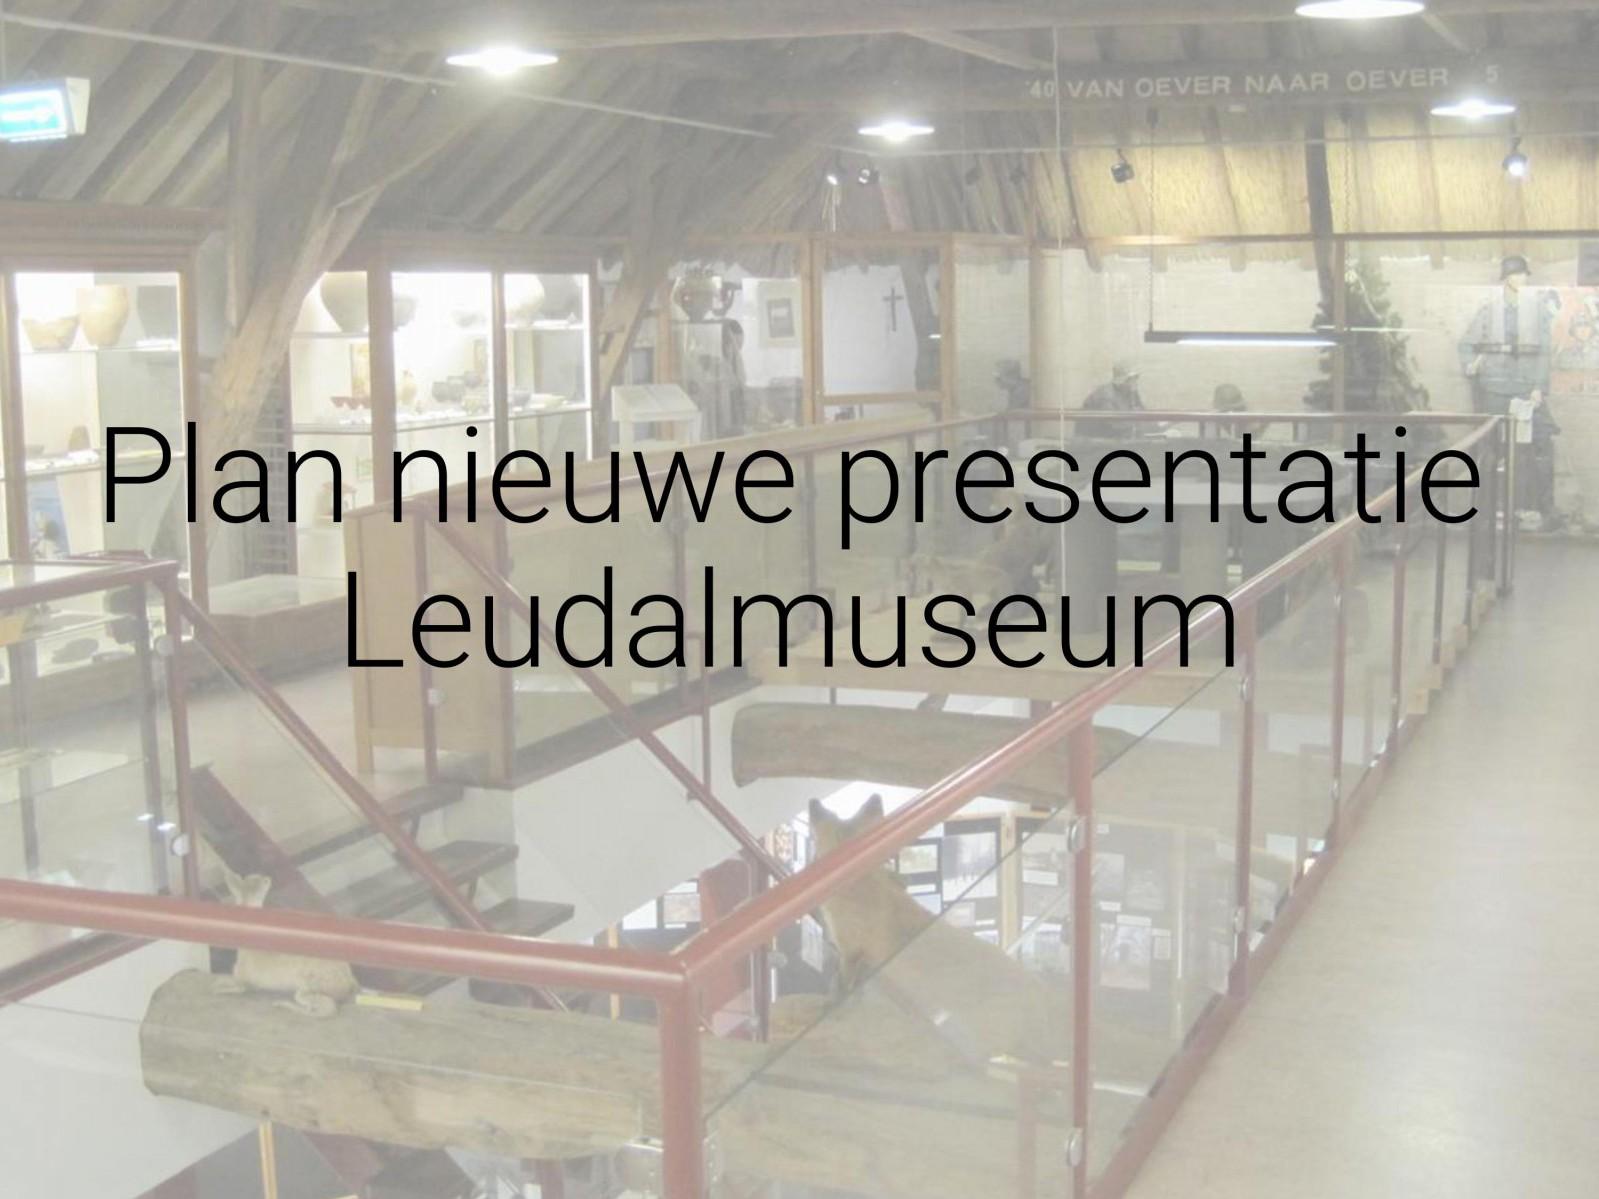 Plan nieuwe presentatie Leudalmuseum